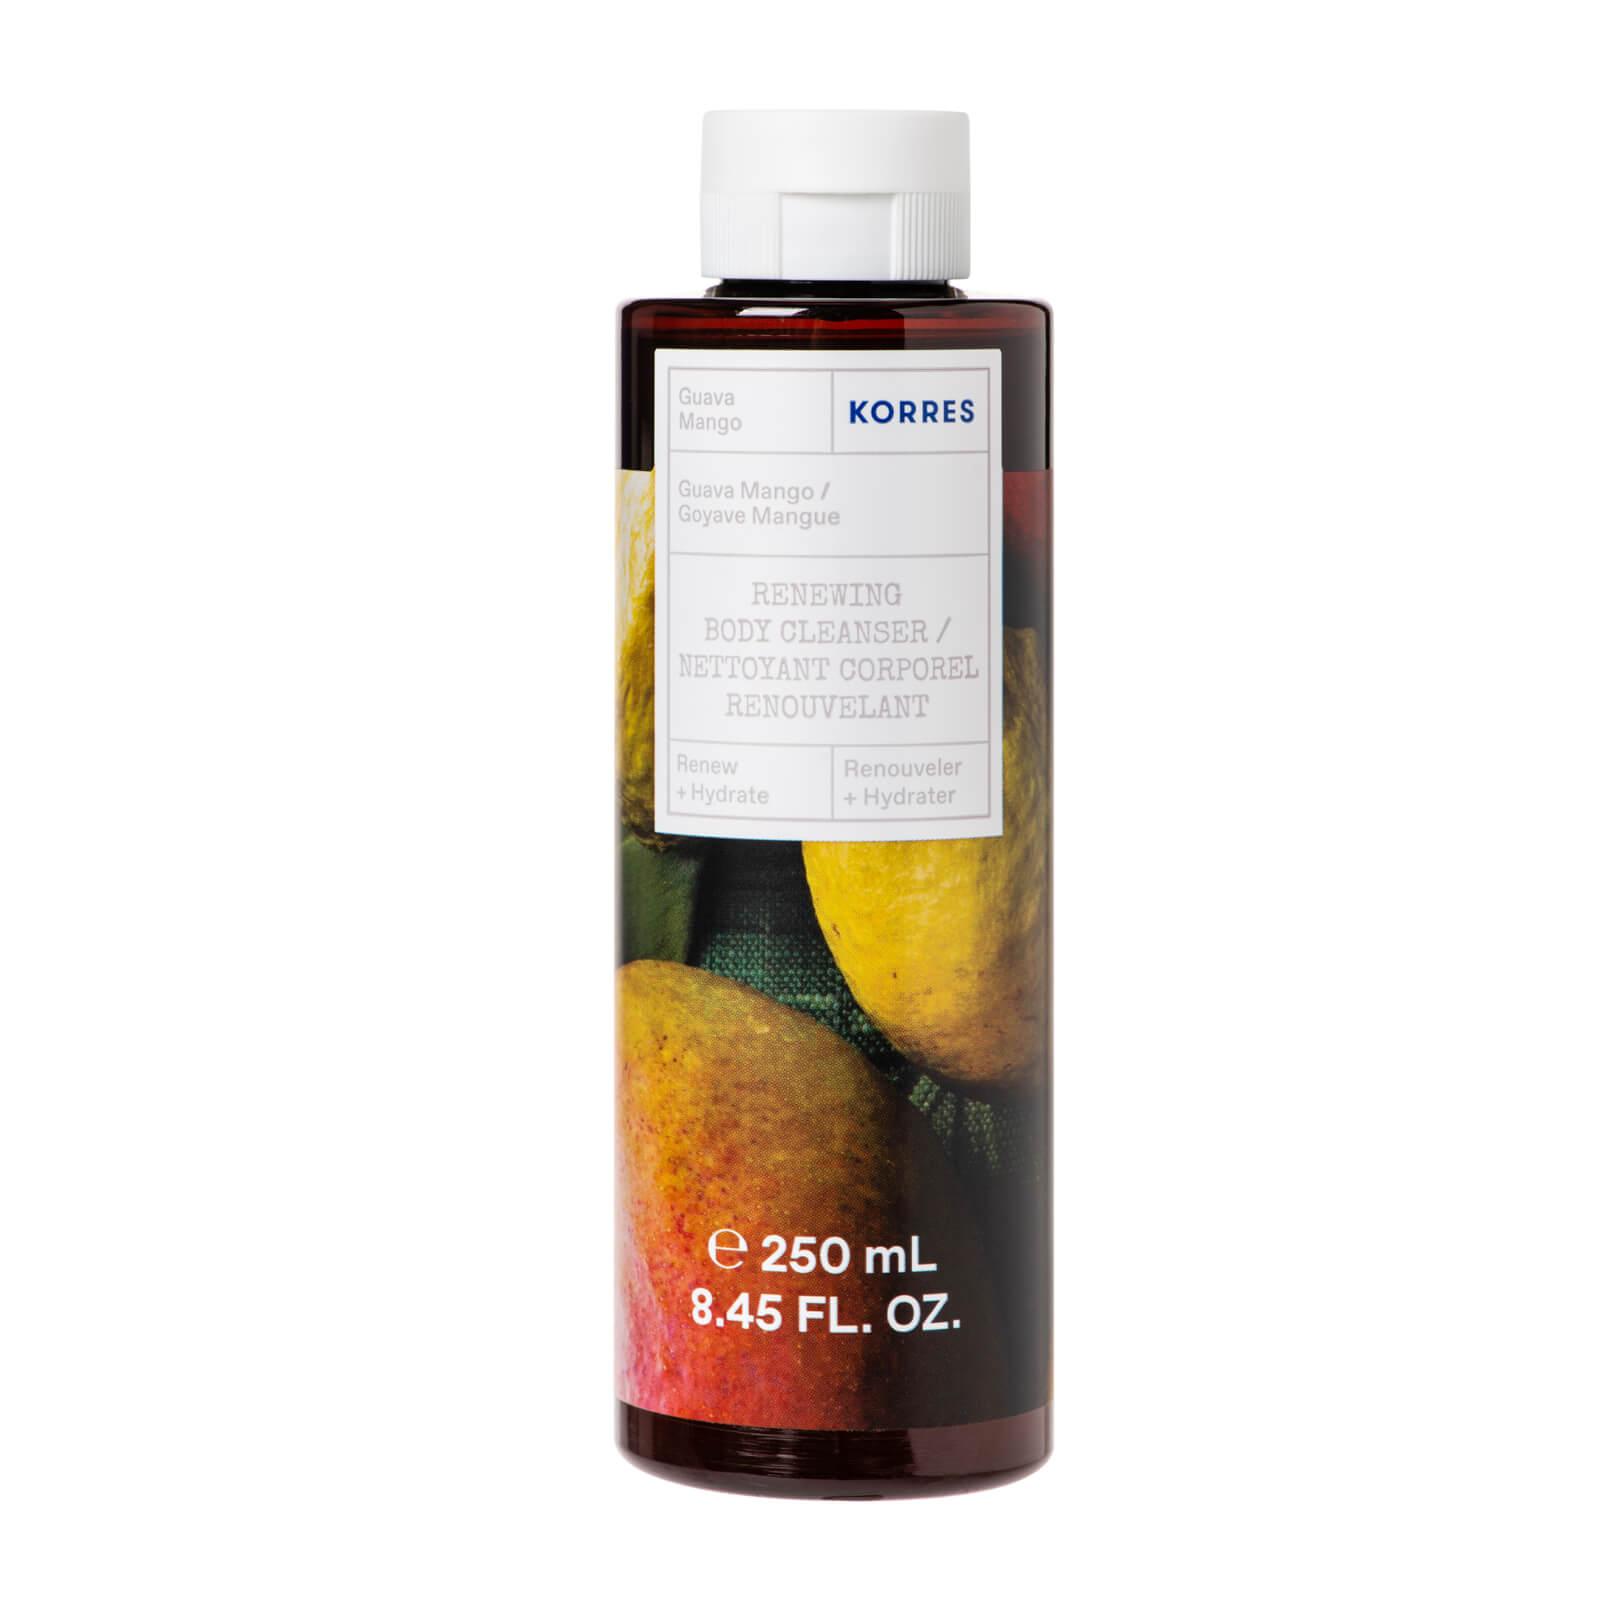 Купить Korres Guava Mango Renewing Body Cleanser 250ml